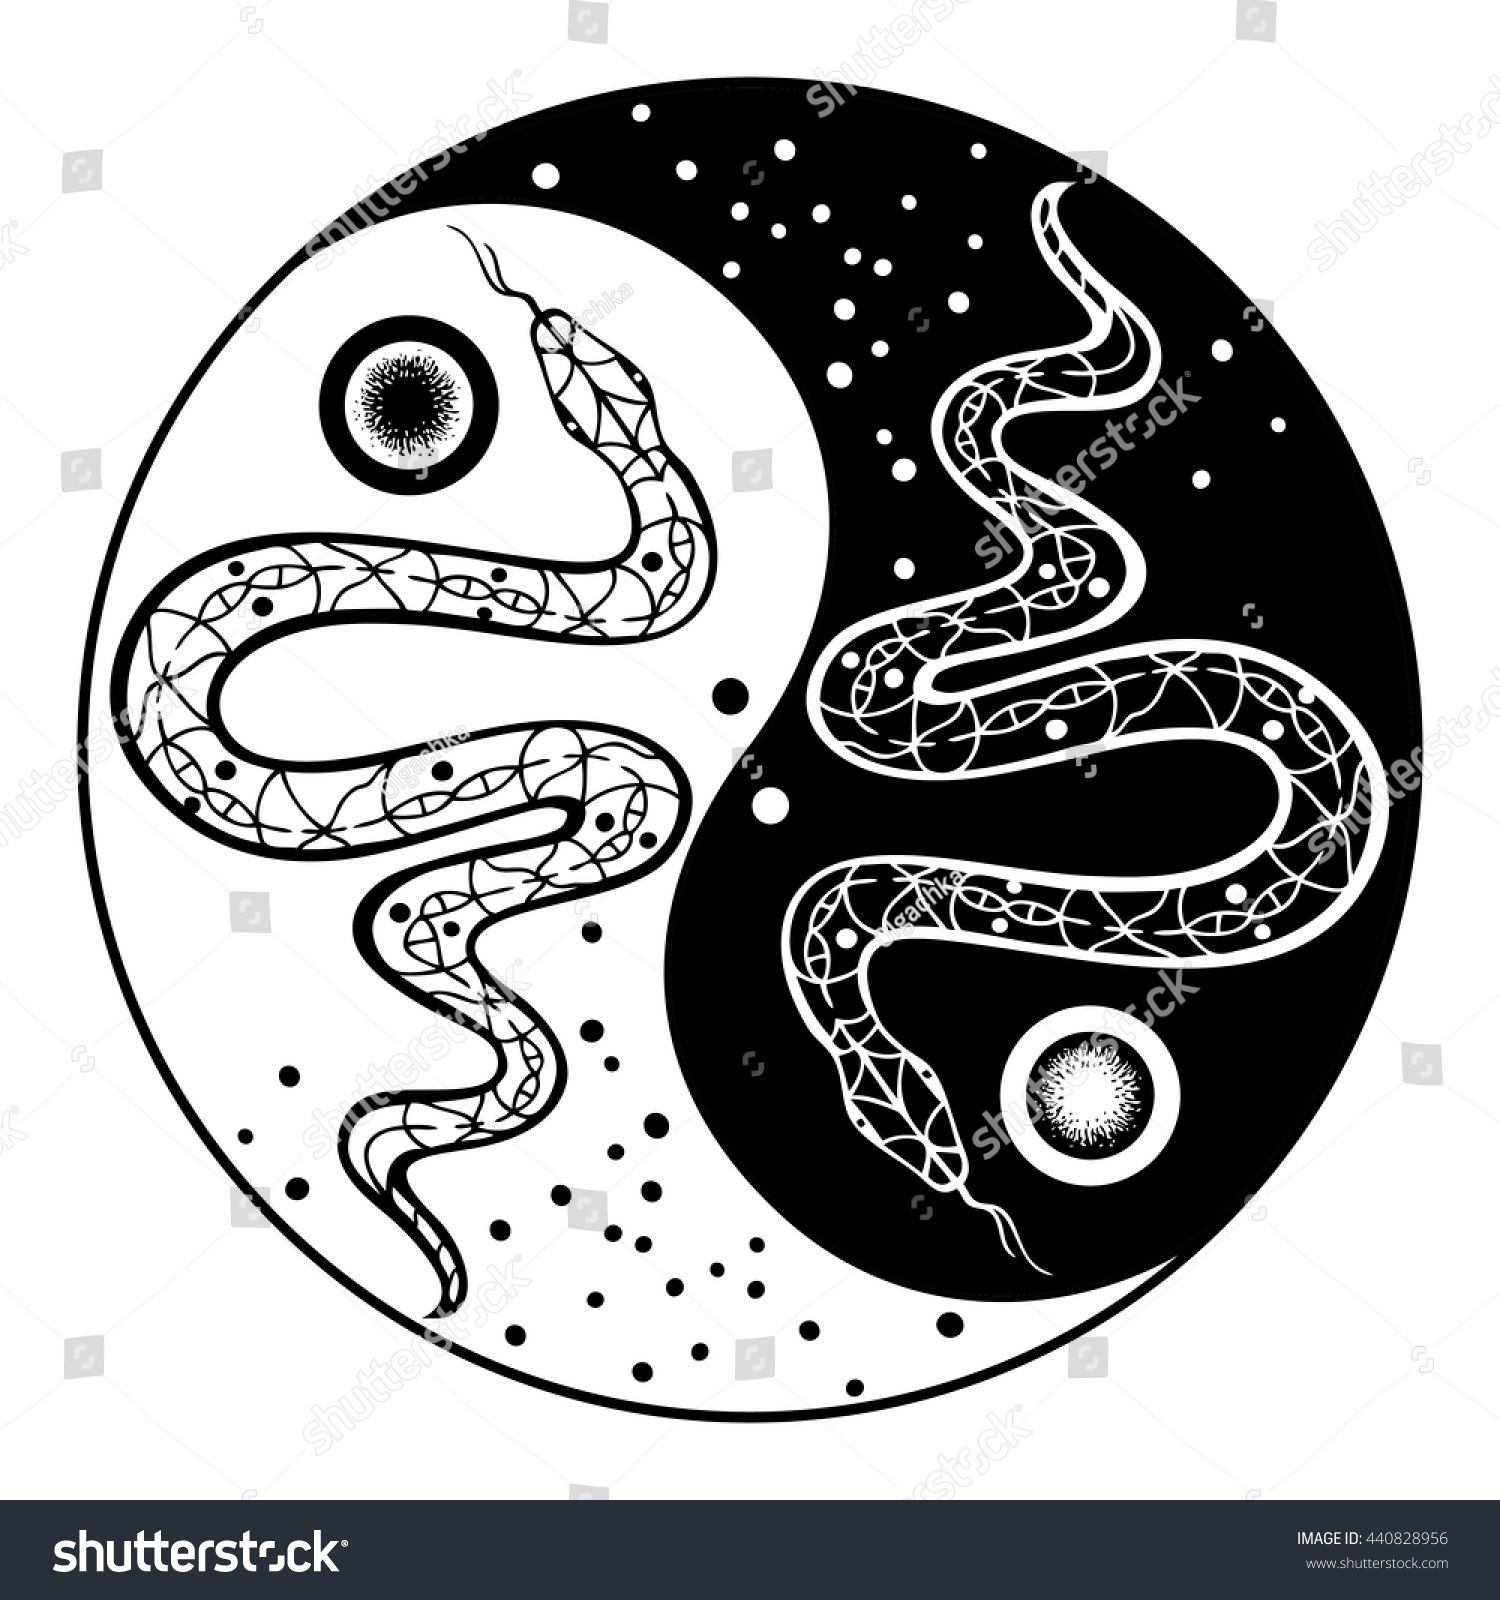 yılan, serpent, yin yang